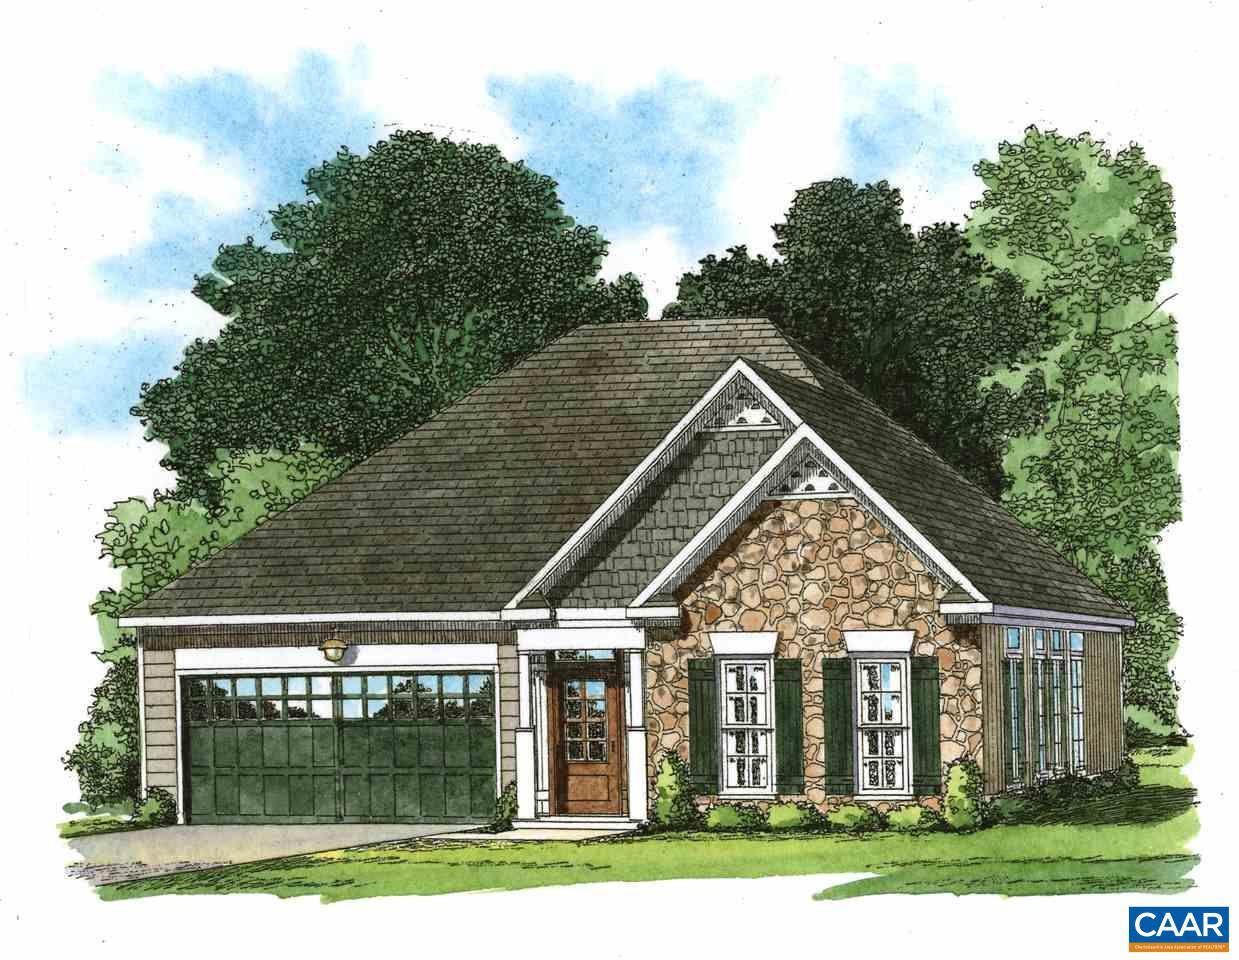 Single Family Home for Sale at 38 LEON Lane 38 LEON Lane Crozet, Virginia 22932 United States